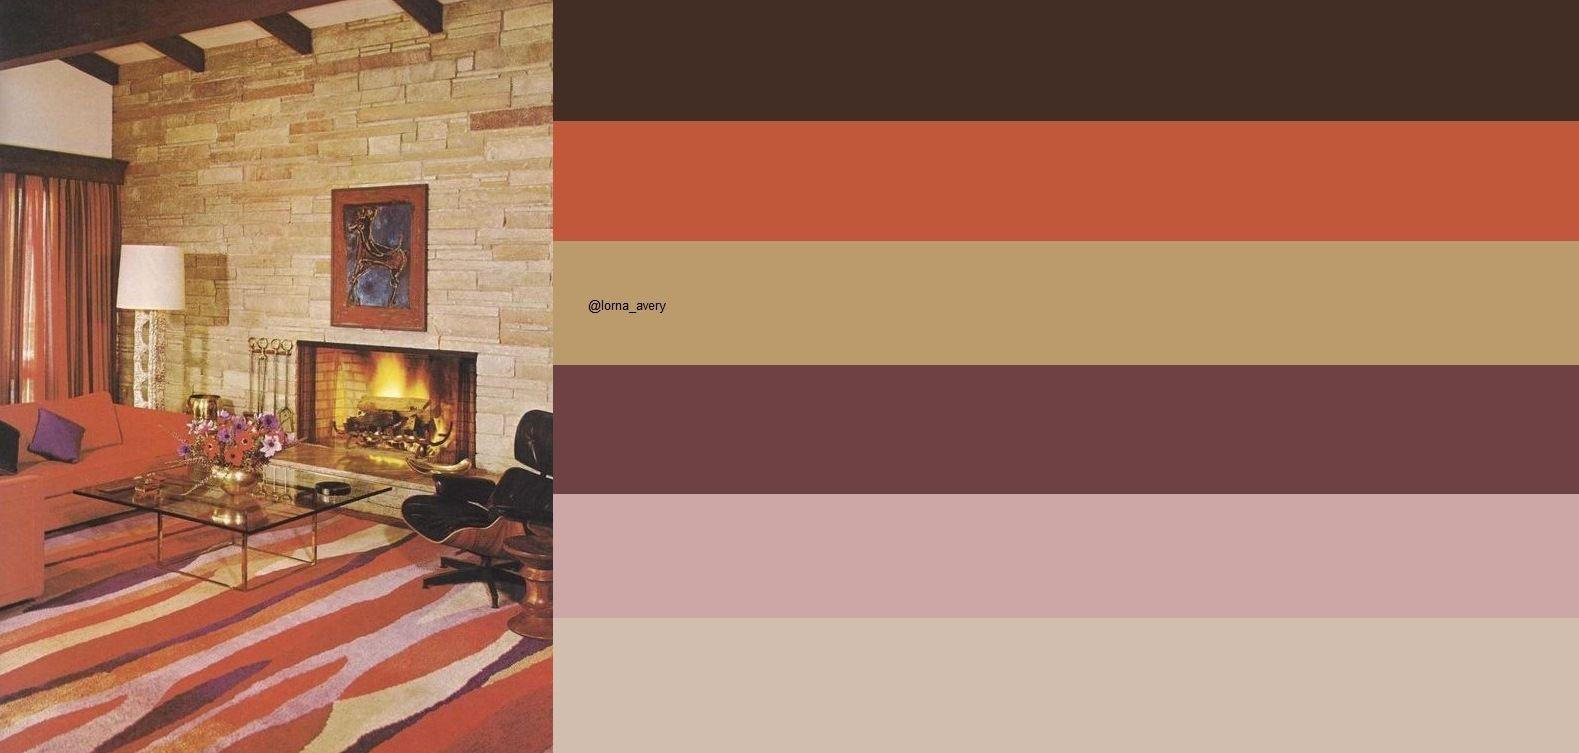 Flooring: original image via https://antiquealterego.com/2012/09/19/1970s-home-decorating-tips-flooring/vintage-home-decorating-floors11/